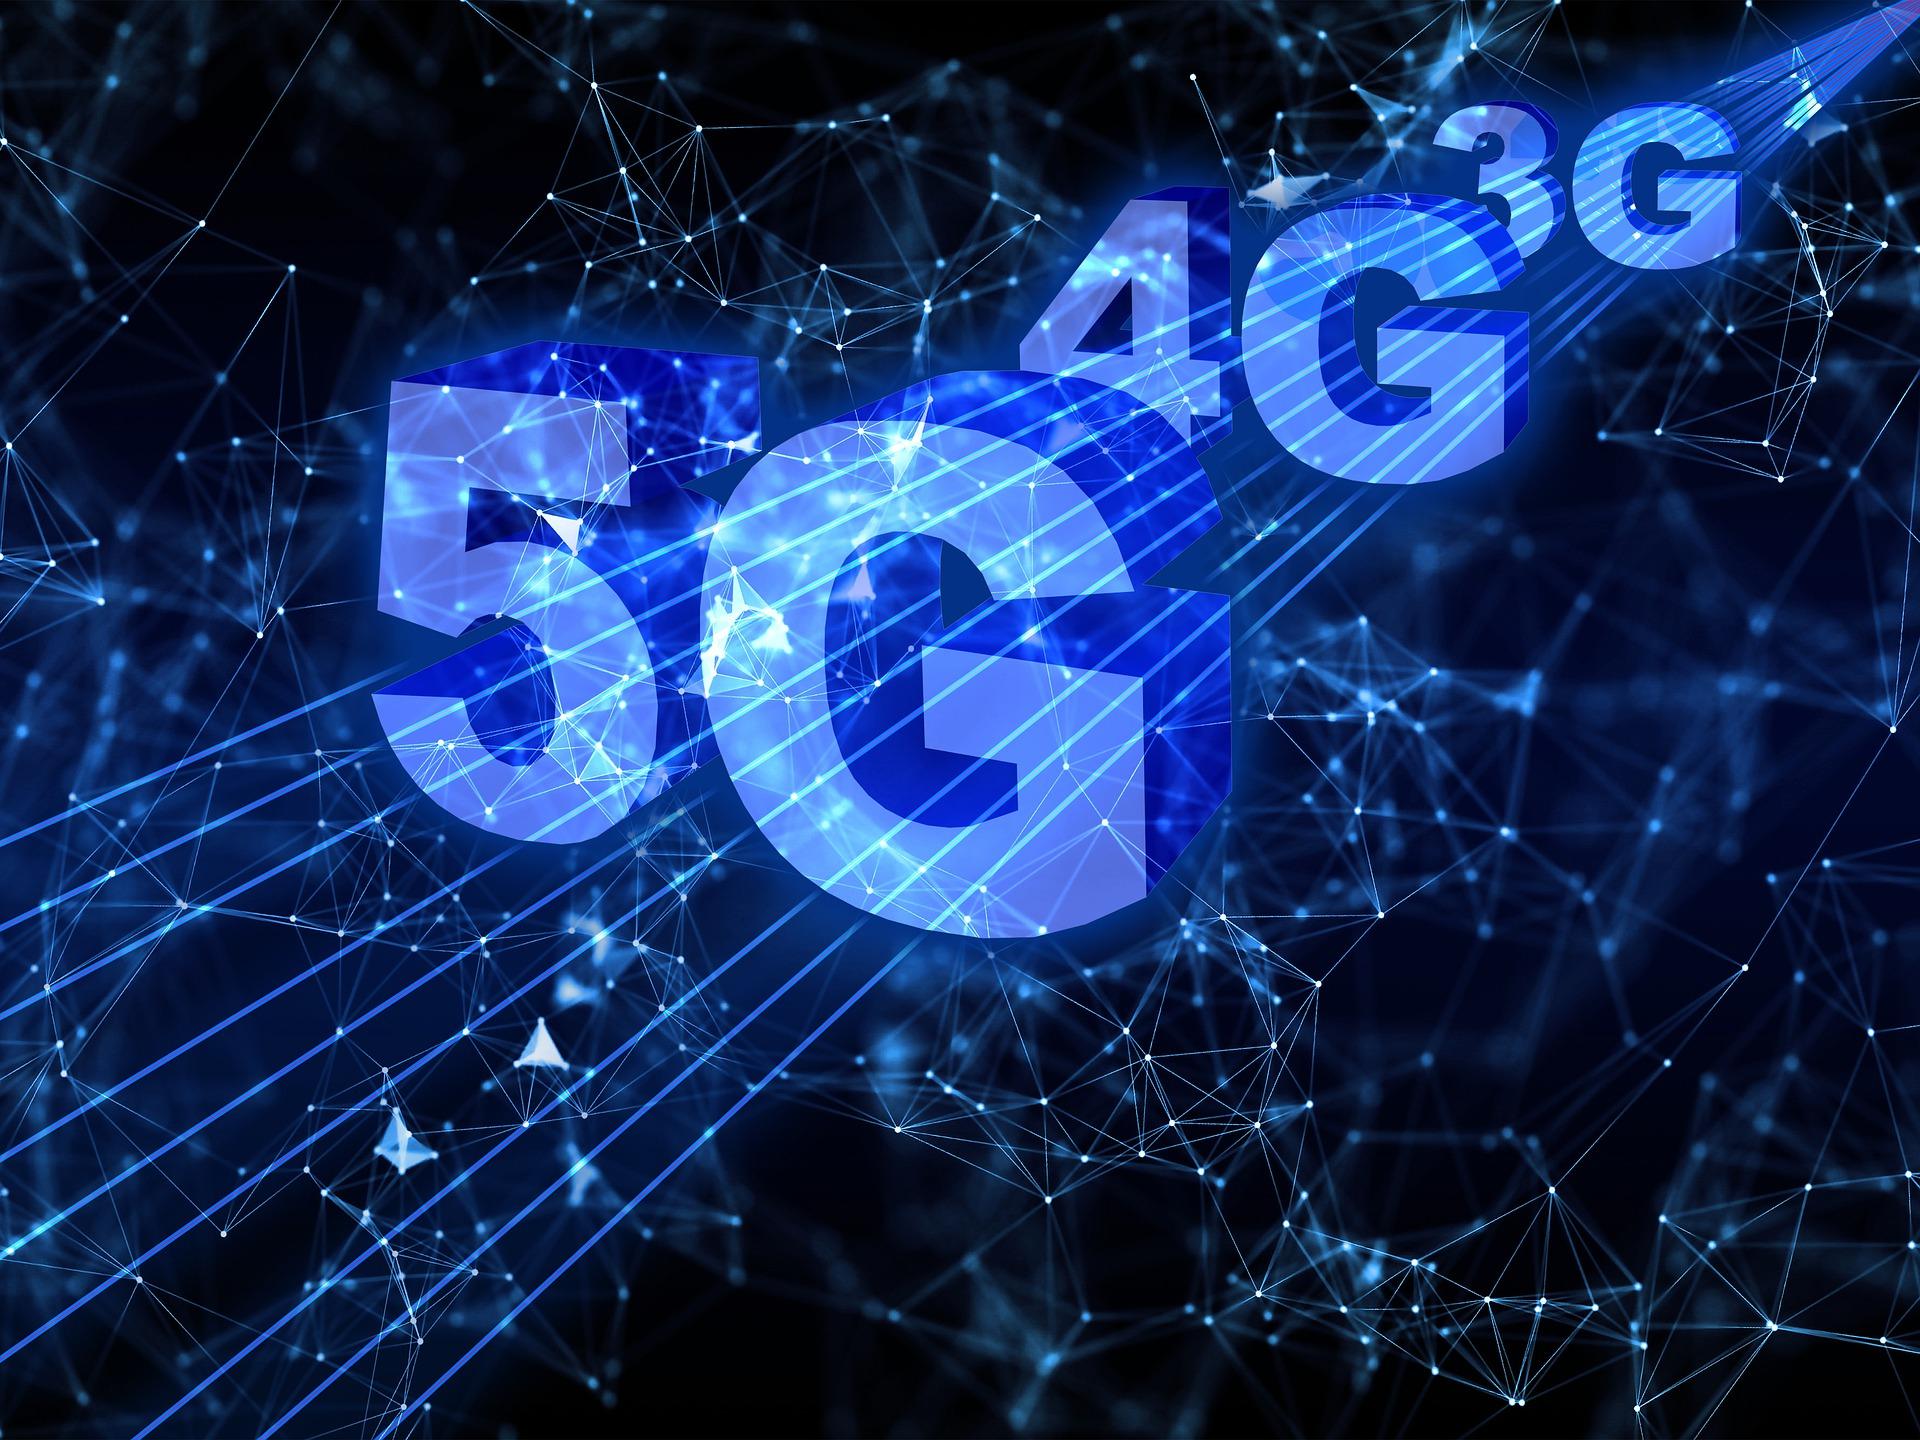 5G agregará valor a diversas industrias: Huawei